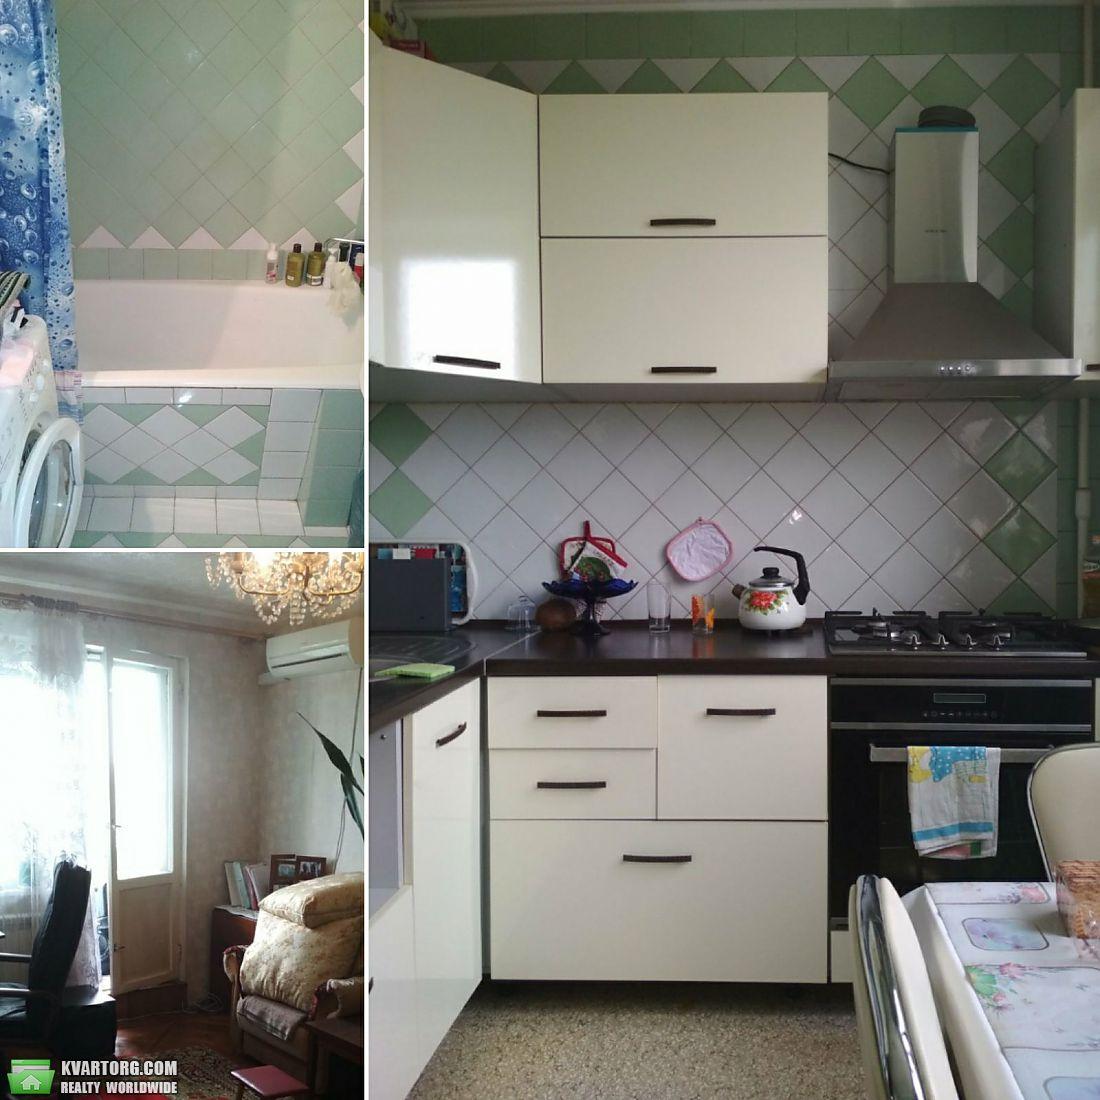 продам 1-комнатную квартиру Харьков, ул.гвардейцев широненнцев